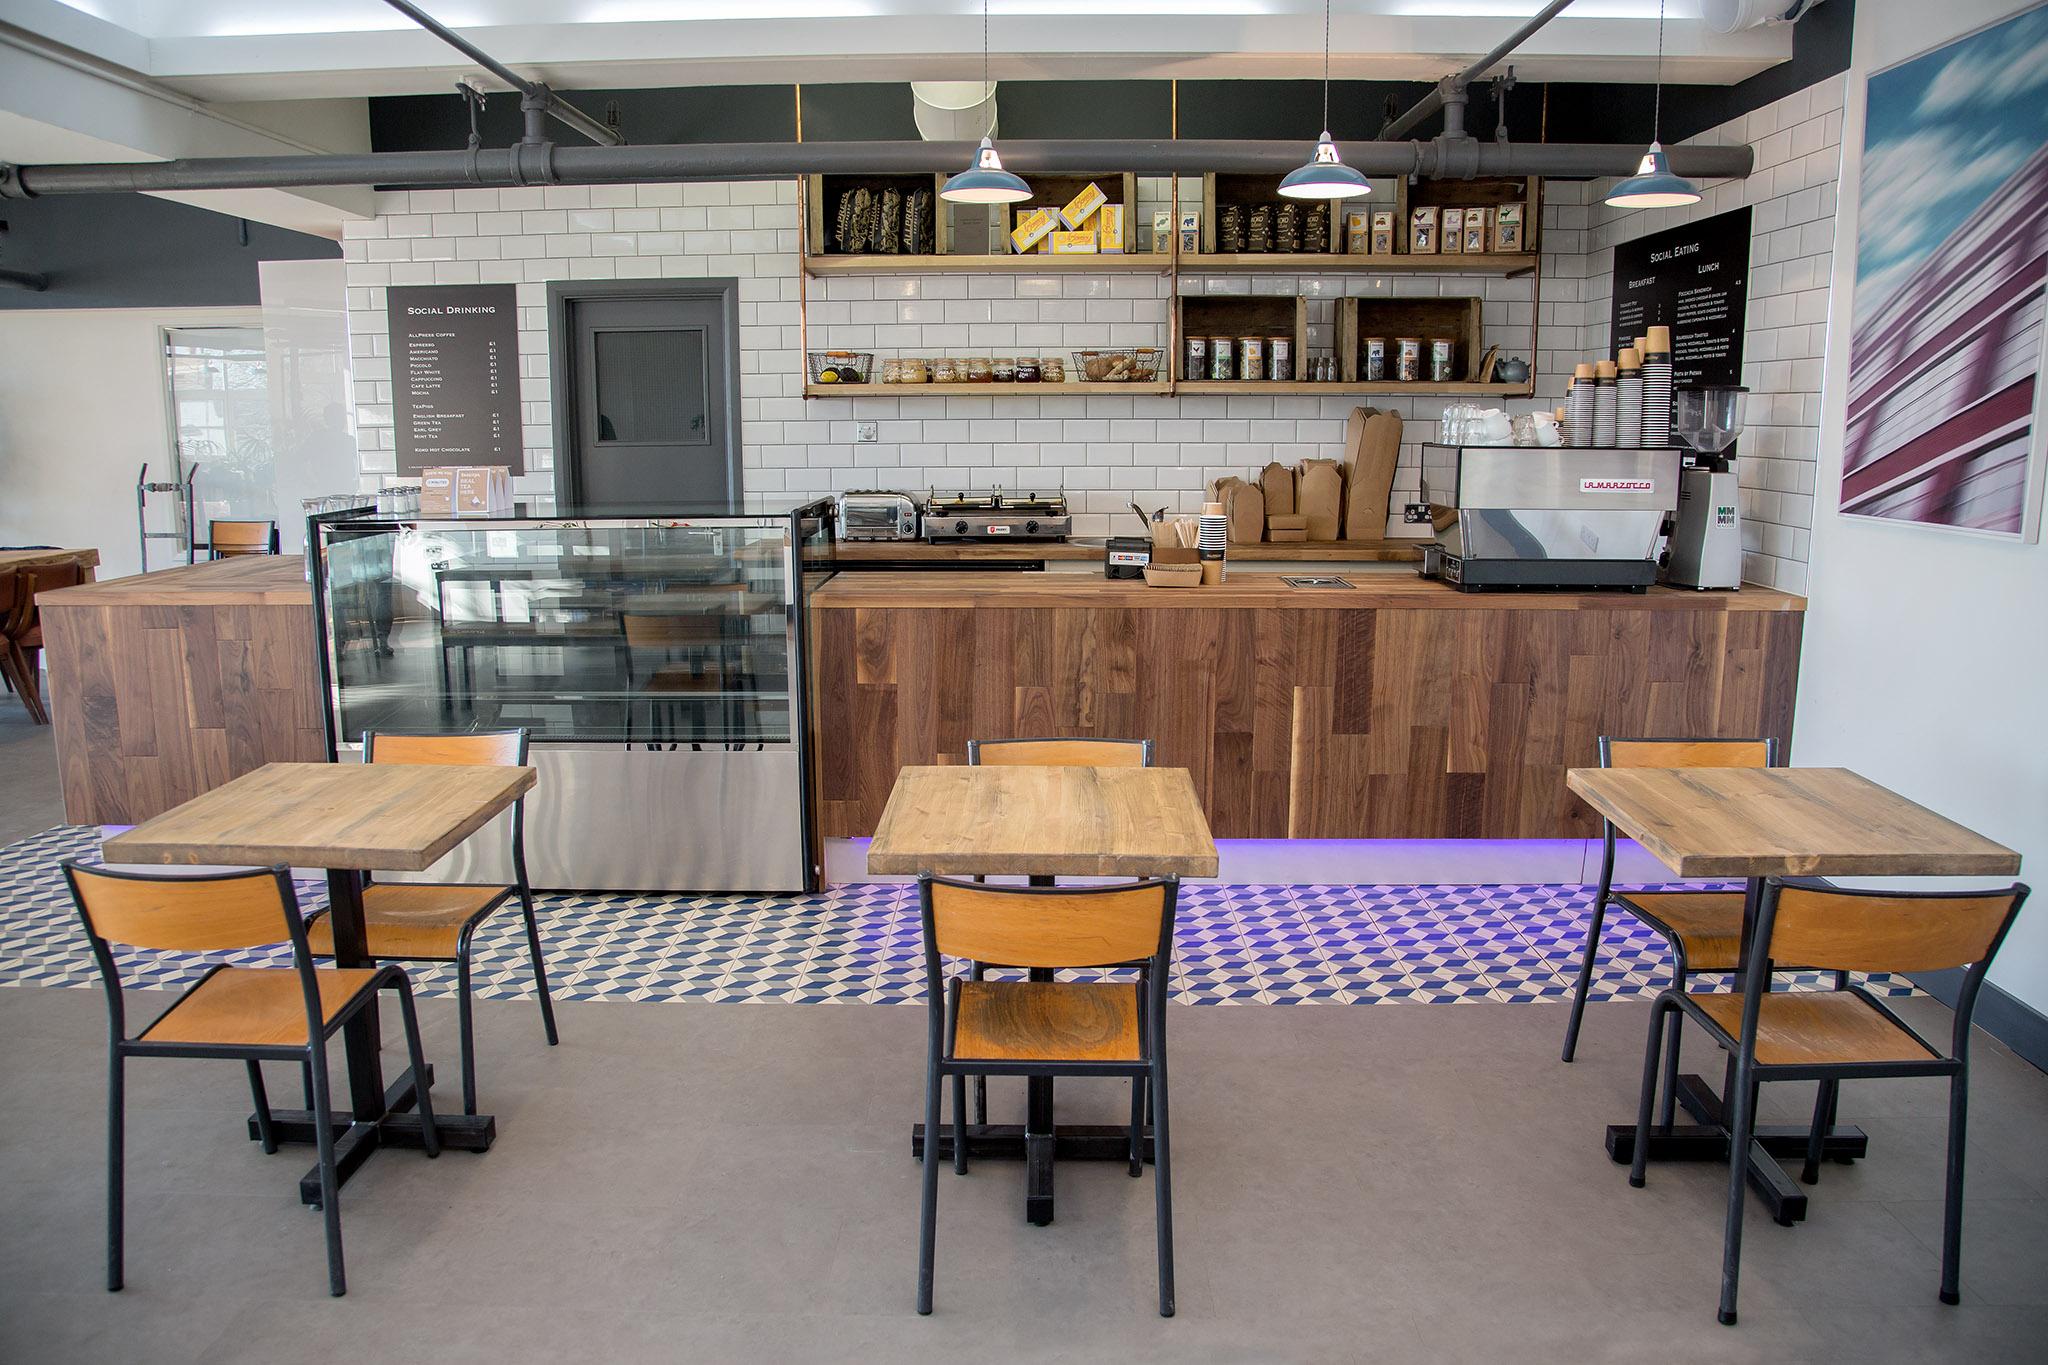 kitchen/breakout space